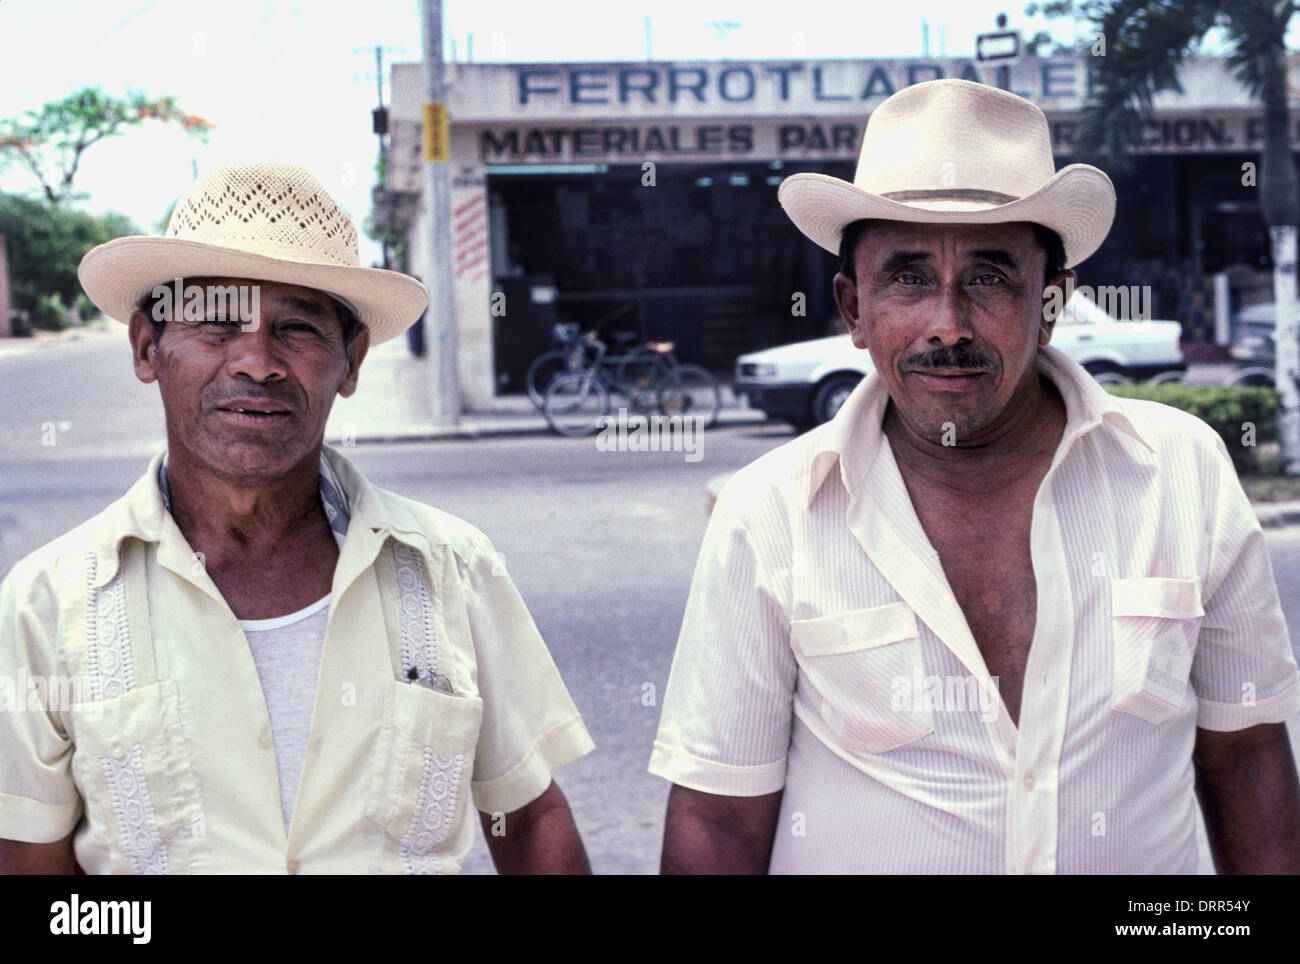 Mexikanische Männer mit Sombrero-hüten in Cozumel, Mexiko